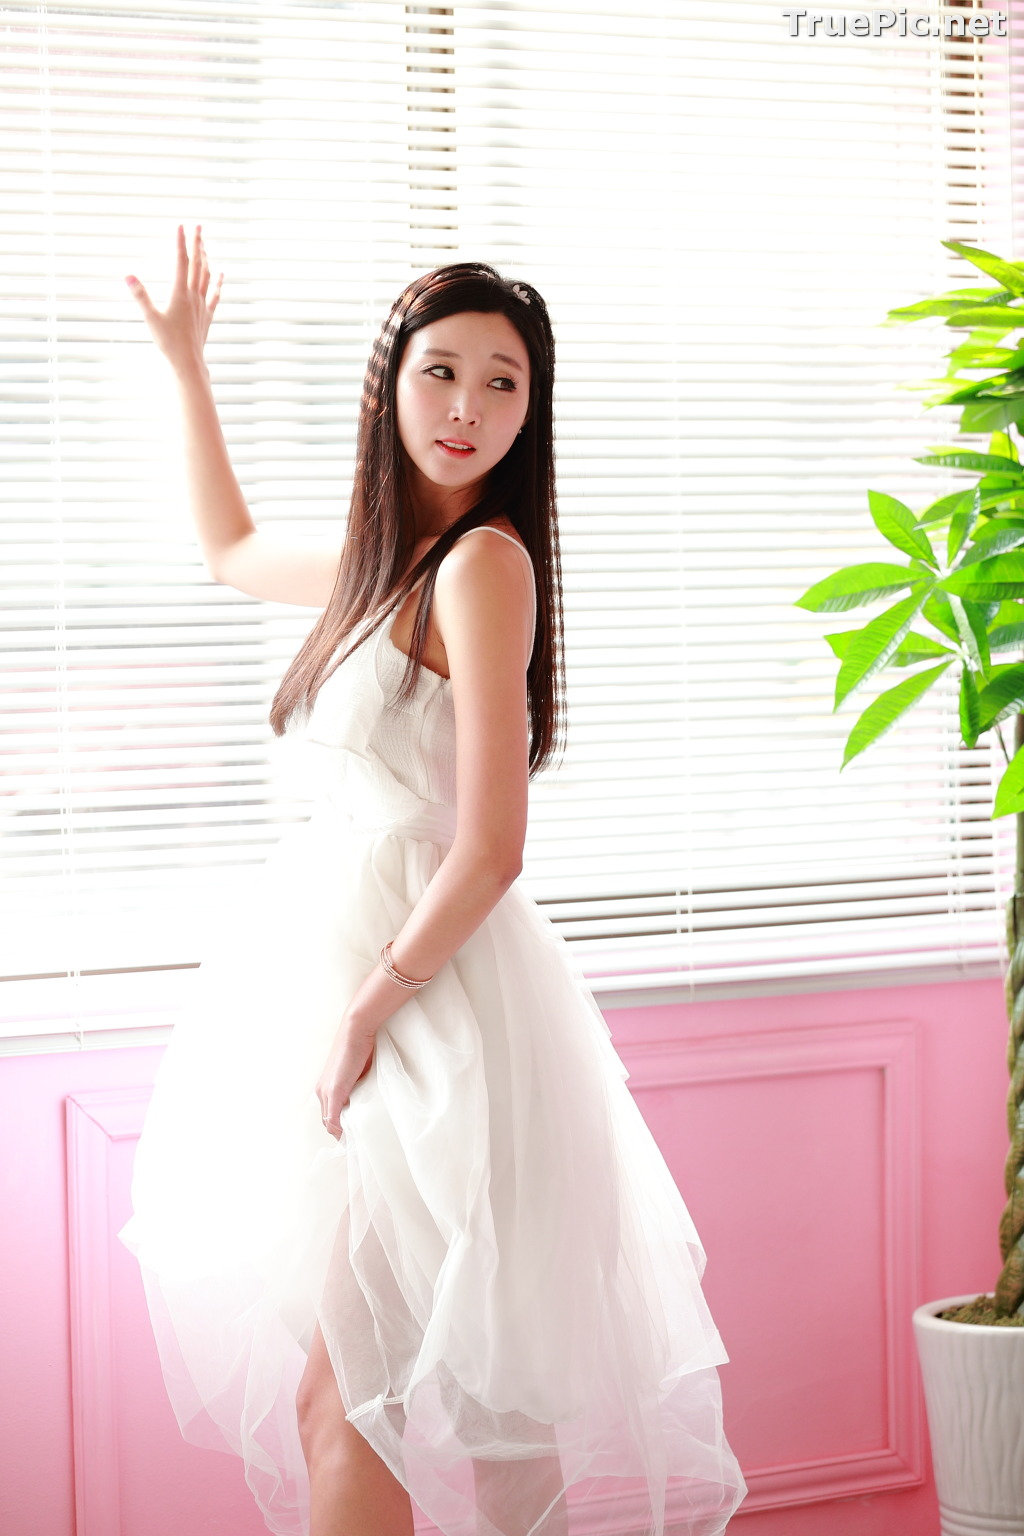 Image Korean Model - Lee Yoo Eun - Studio Photo Collection - TruePic.net - Picture-1